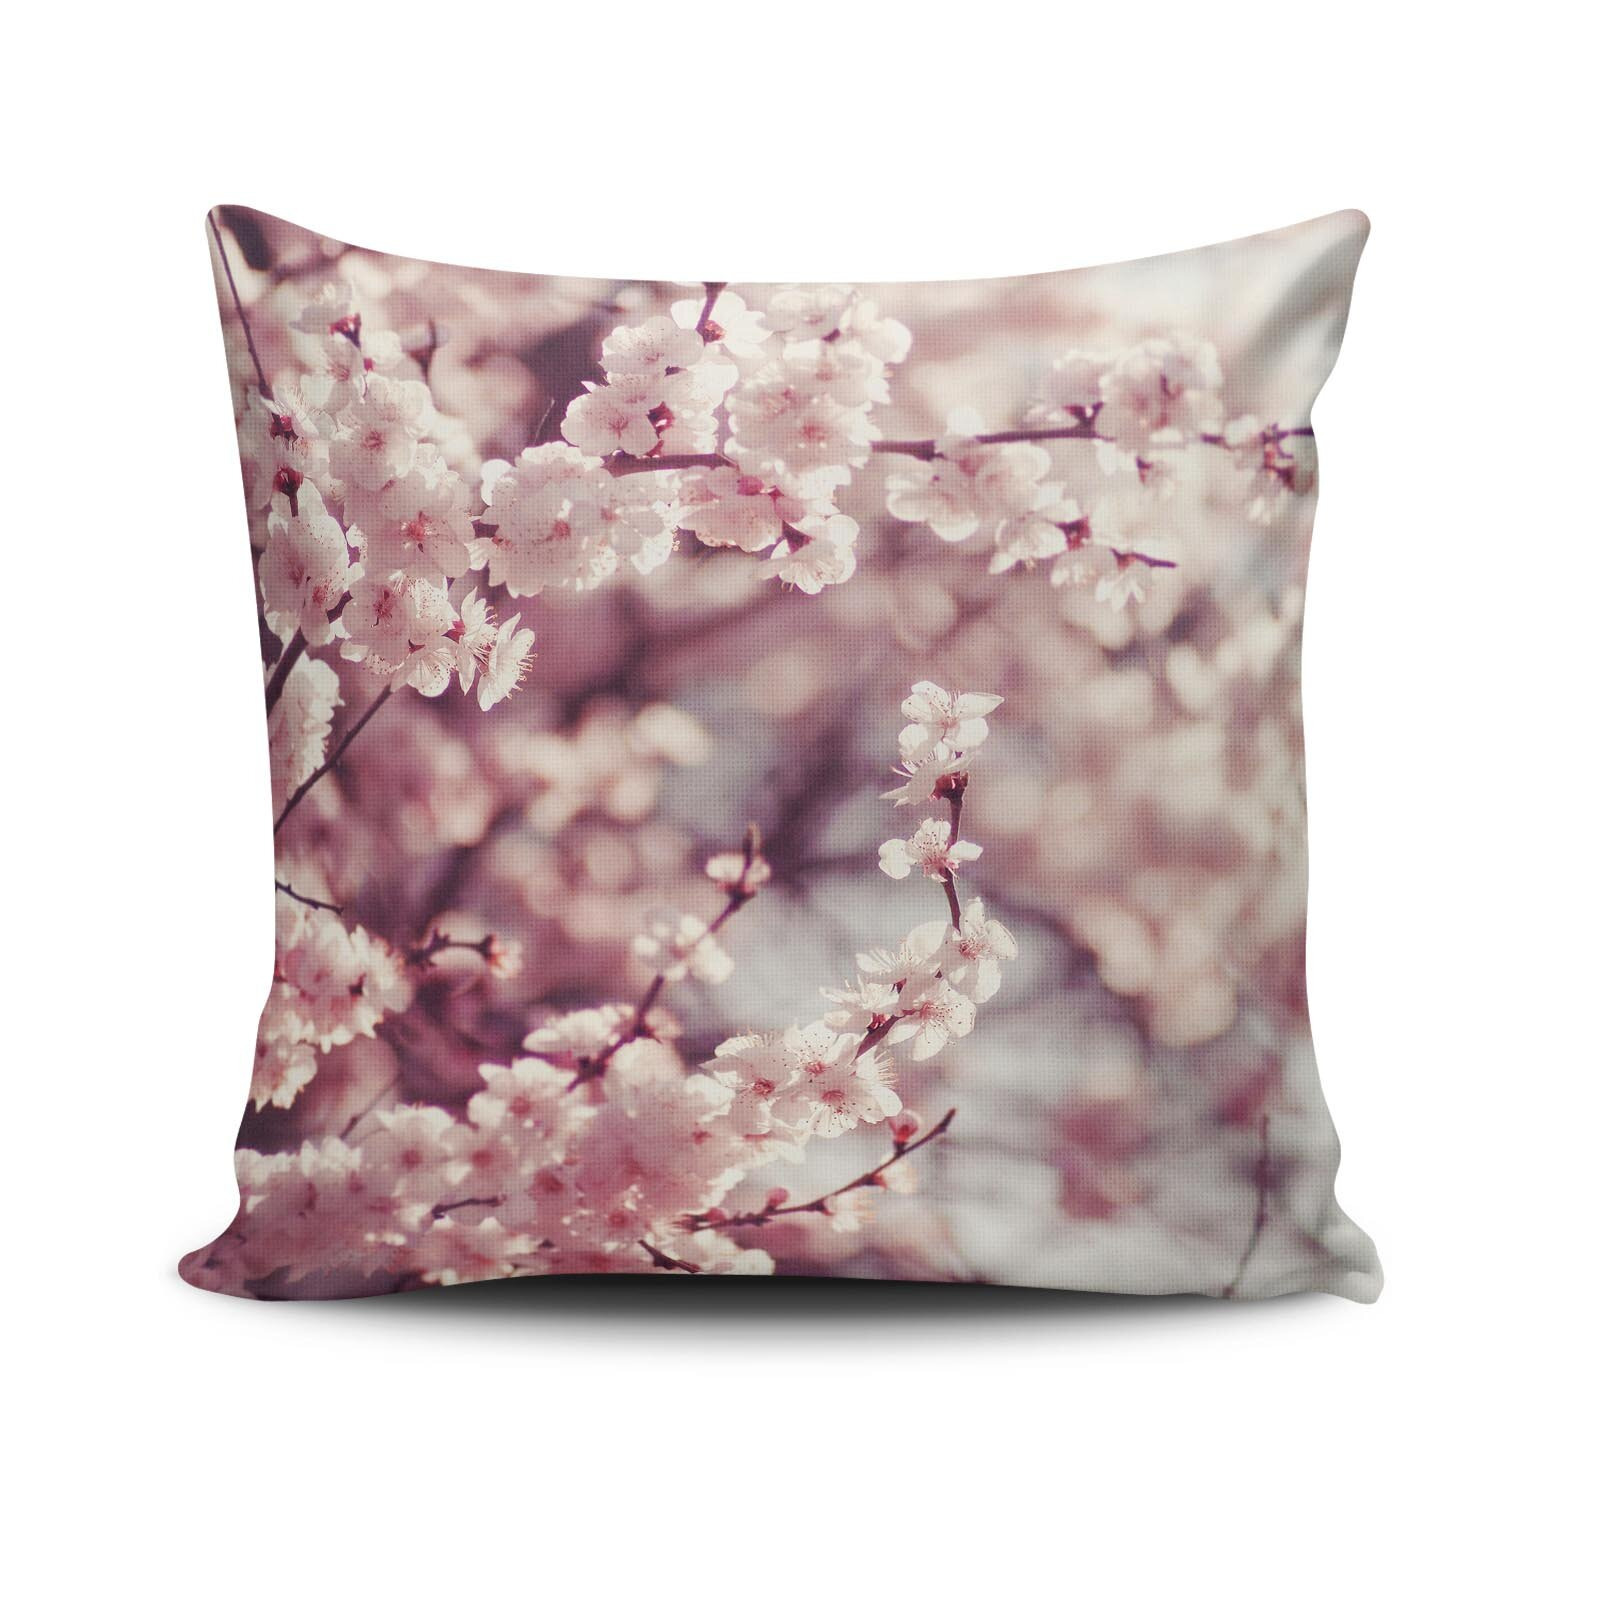 Perna decorativa Cushion Love, Dimensiune: 45 x 45 cm, Material exterior: 50% bumbac / 50% poliester 768CLV0127